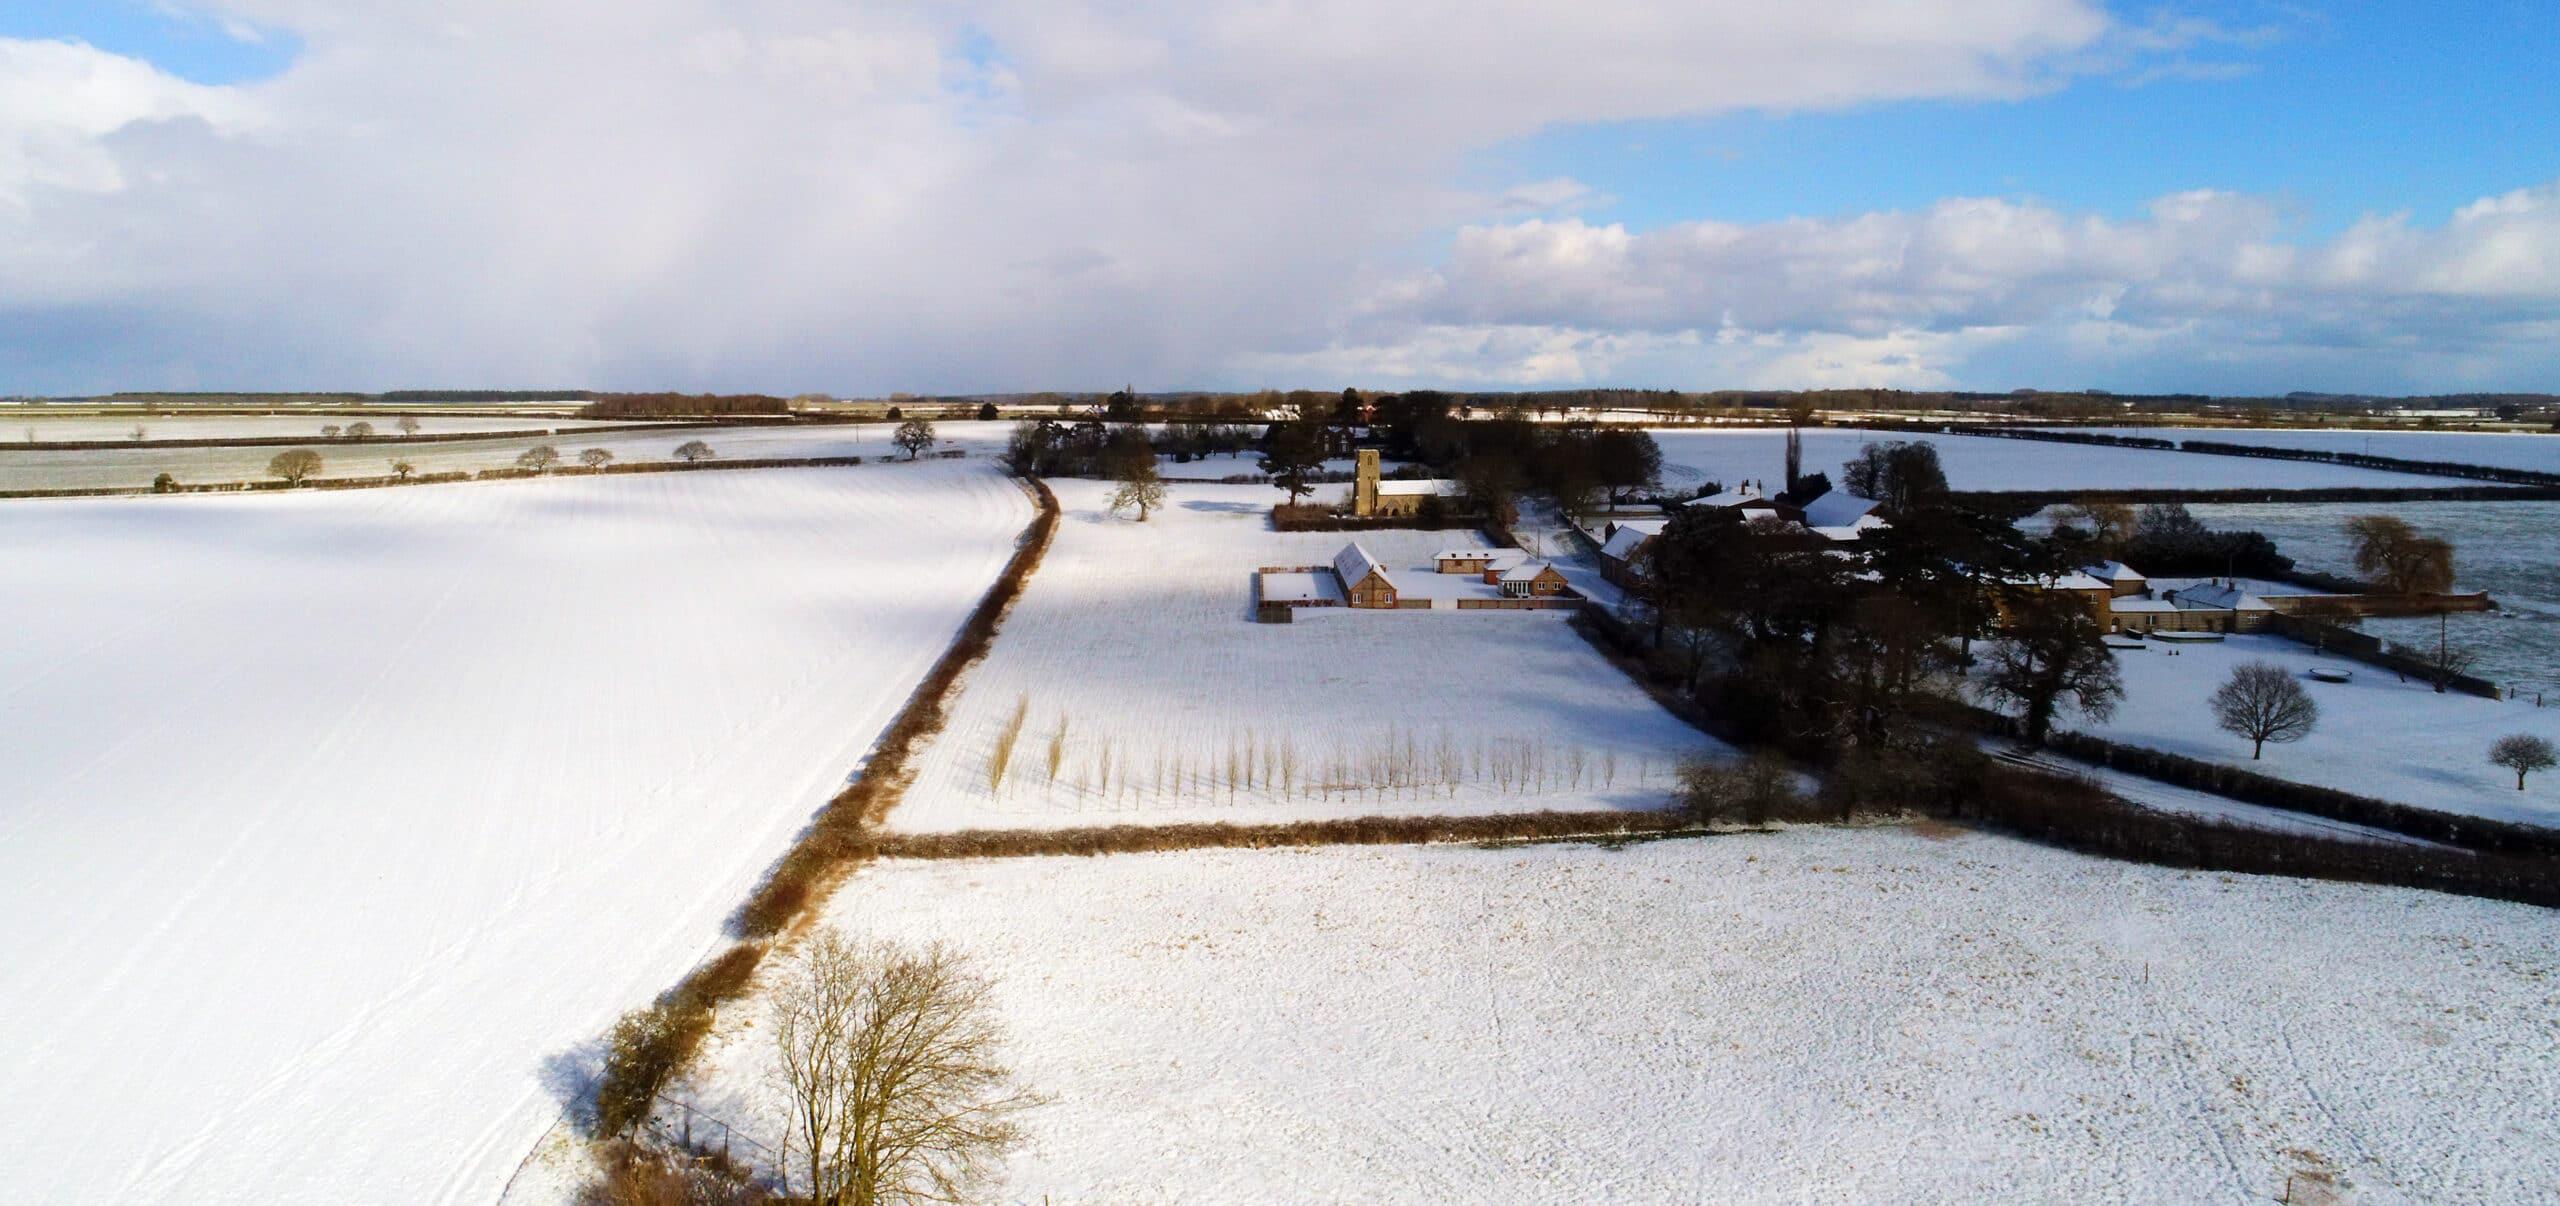 Brazenhall Barns Aerial Winter View